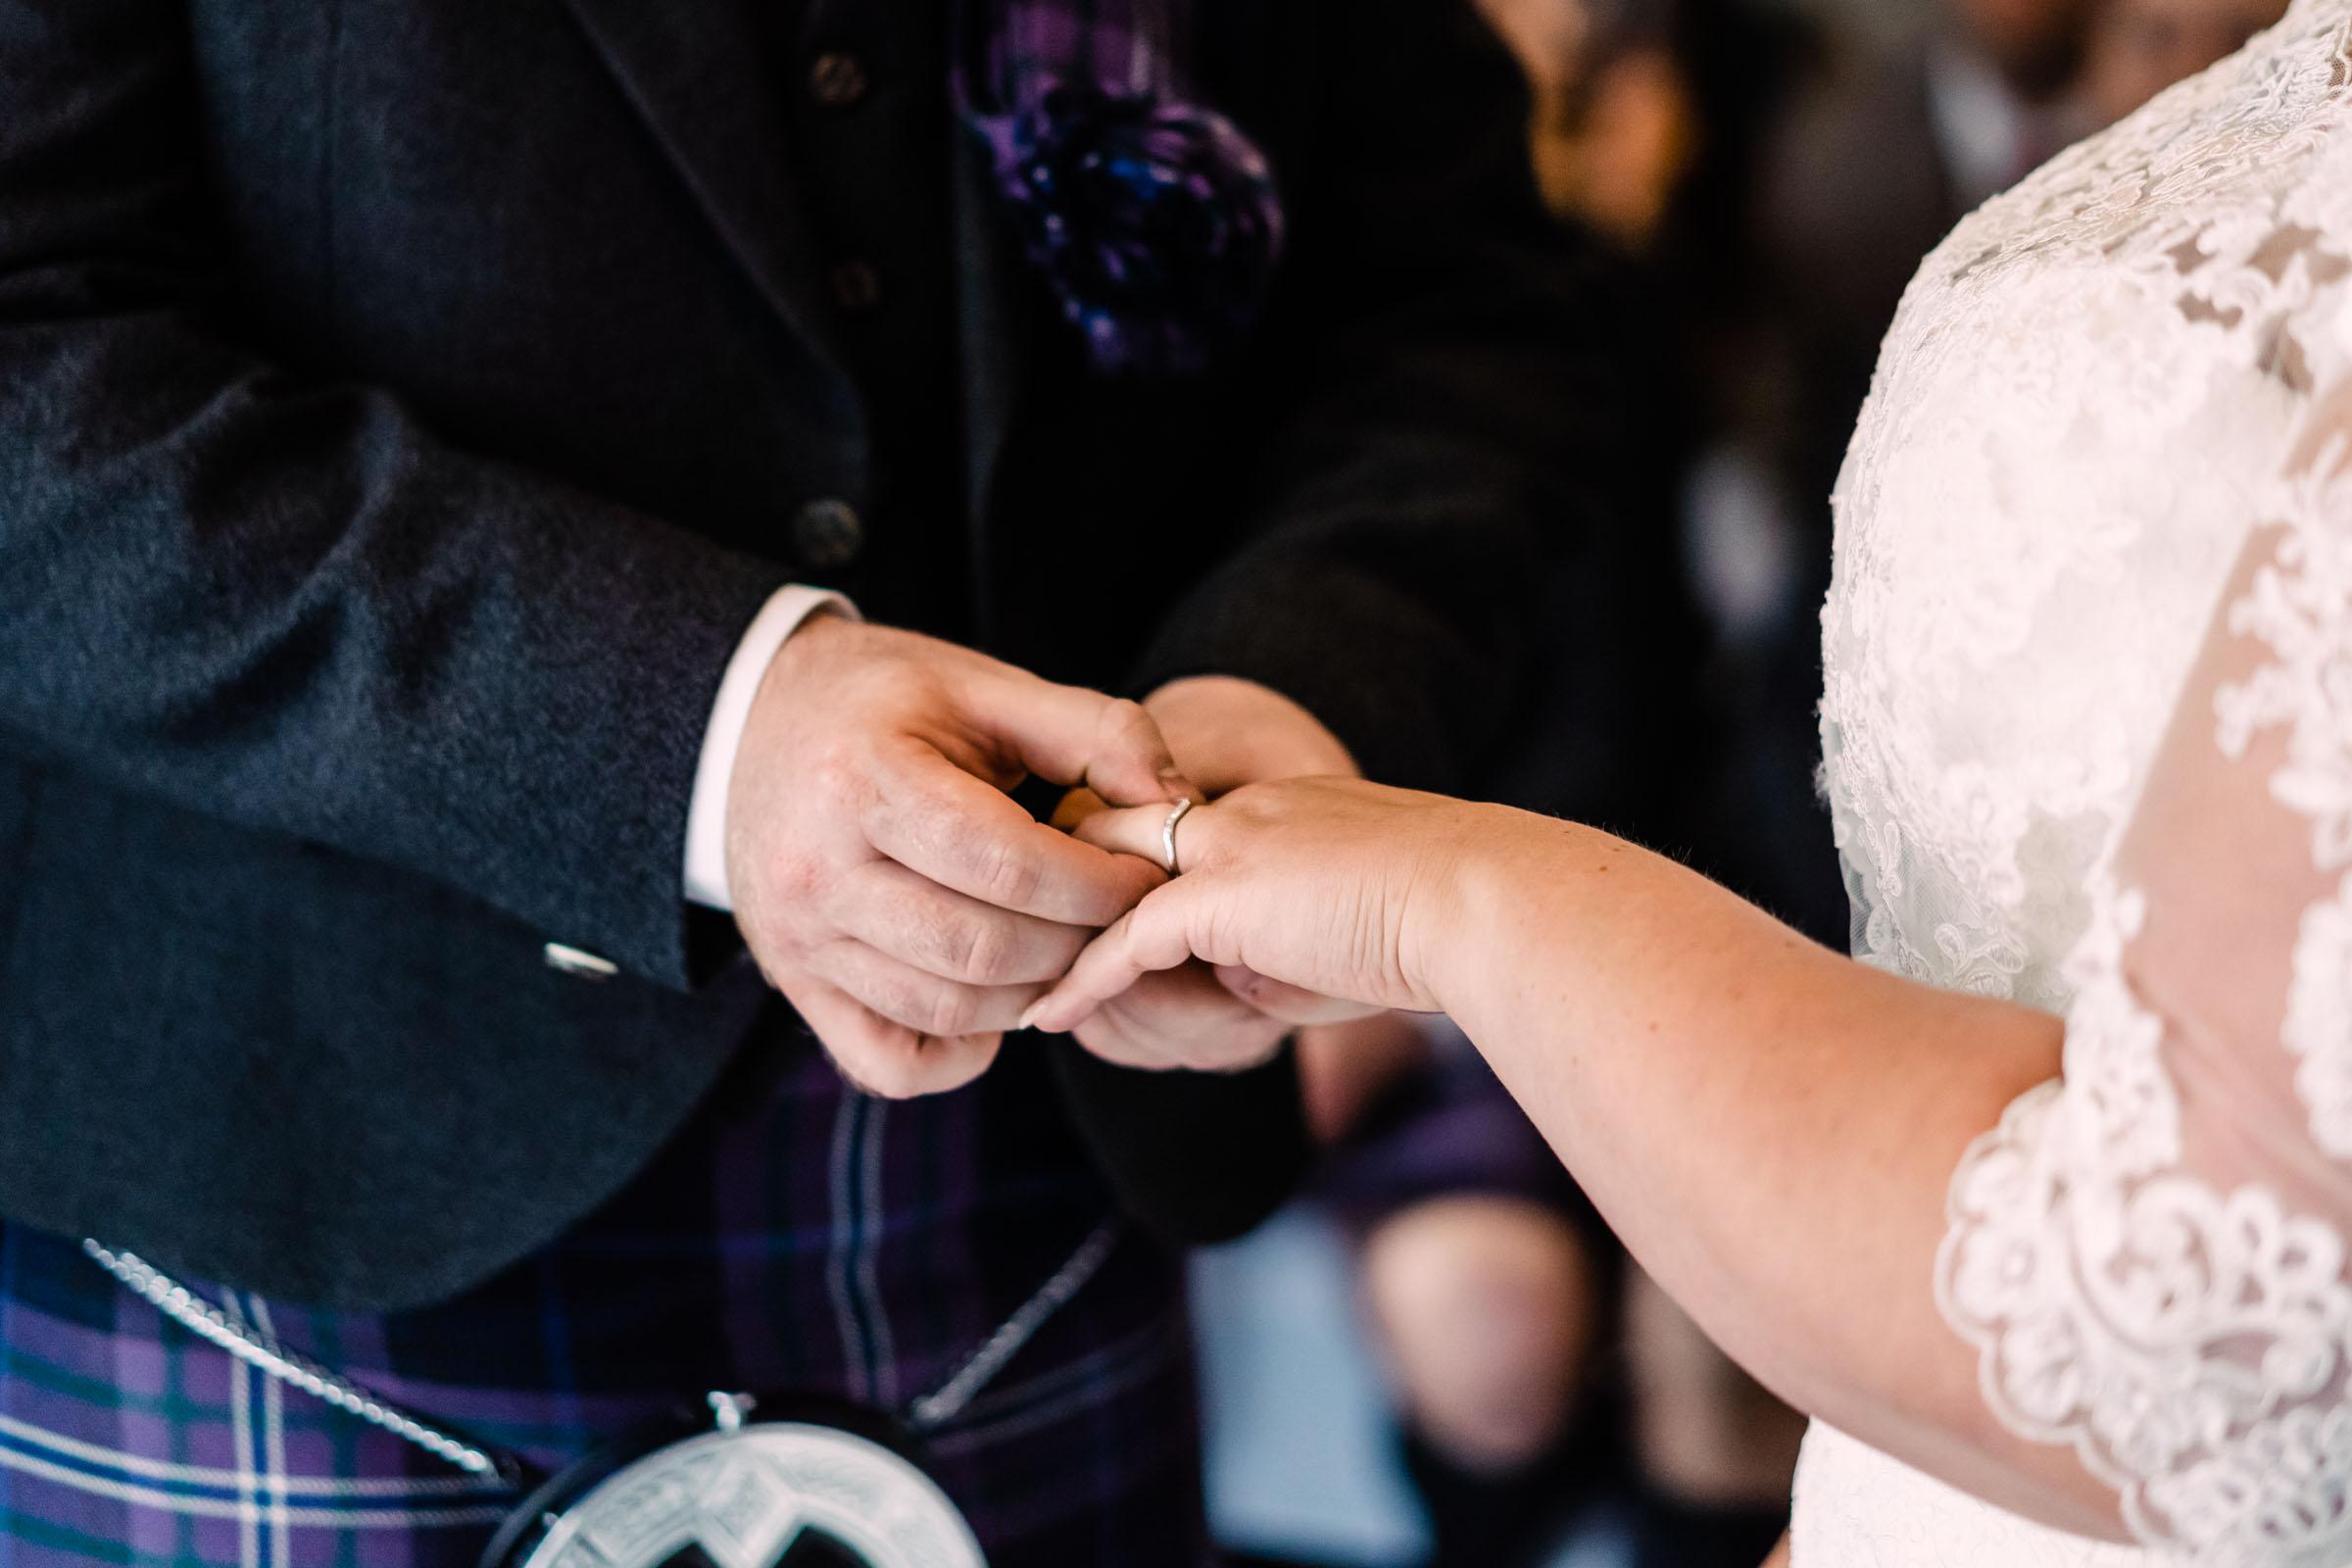 motherwell-moorings-wedding-photographer-dearlyphotography (42 of 77).jpg